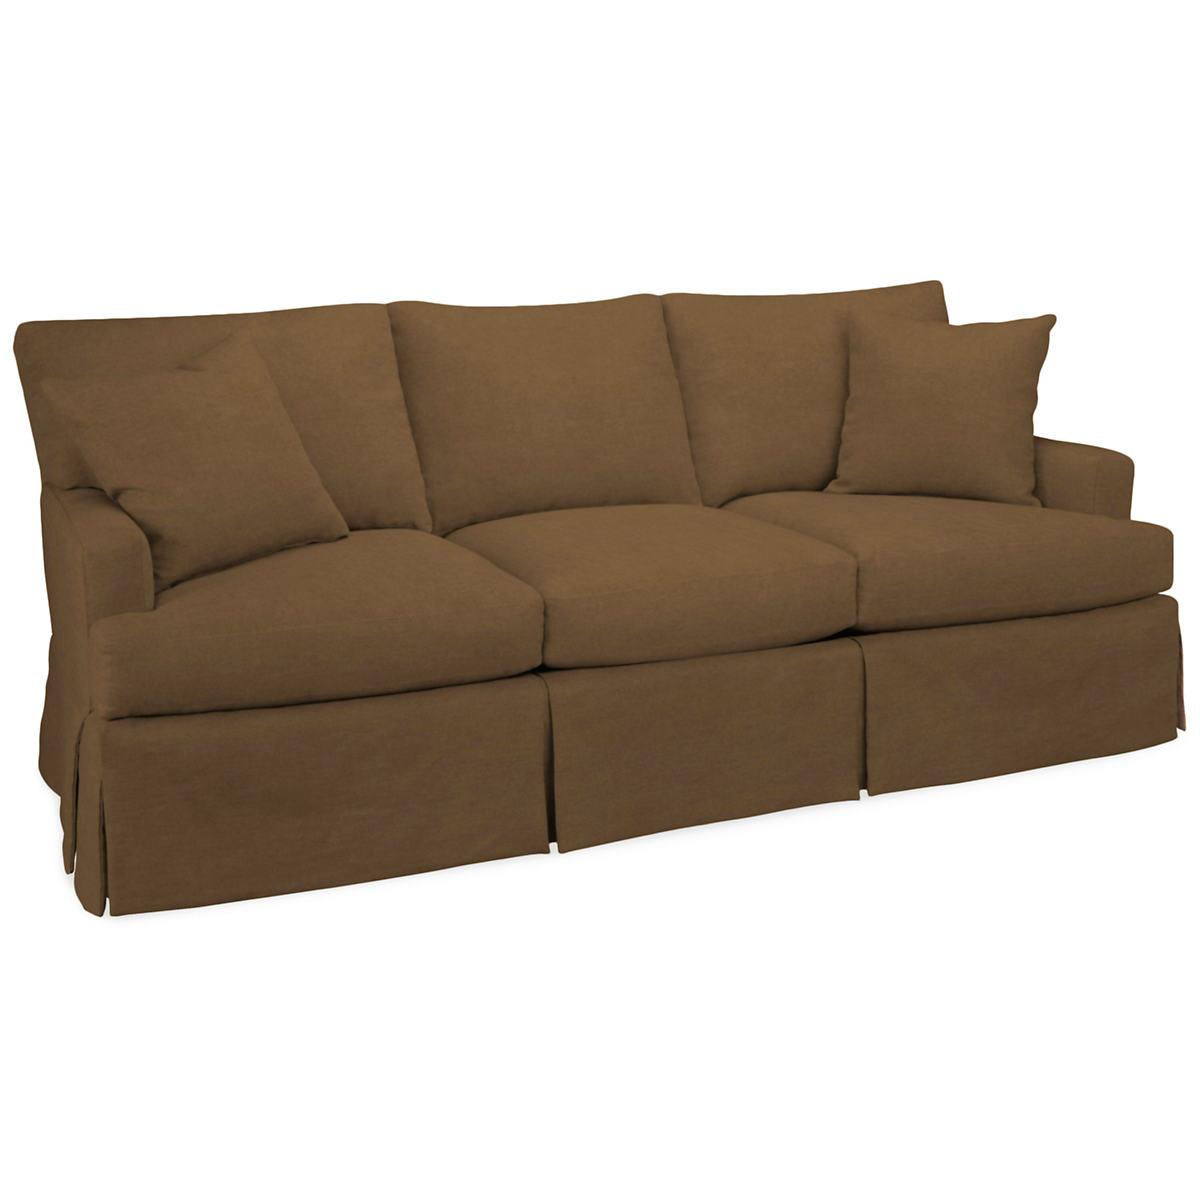 Velvesuede Camel Saybrook 3 Seater Sofa